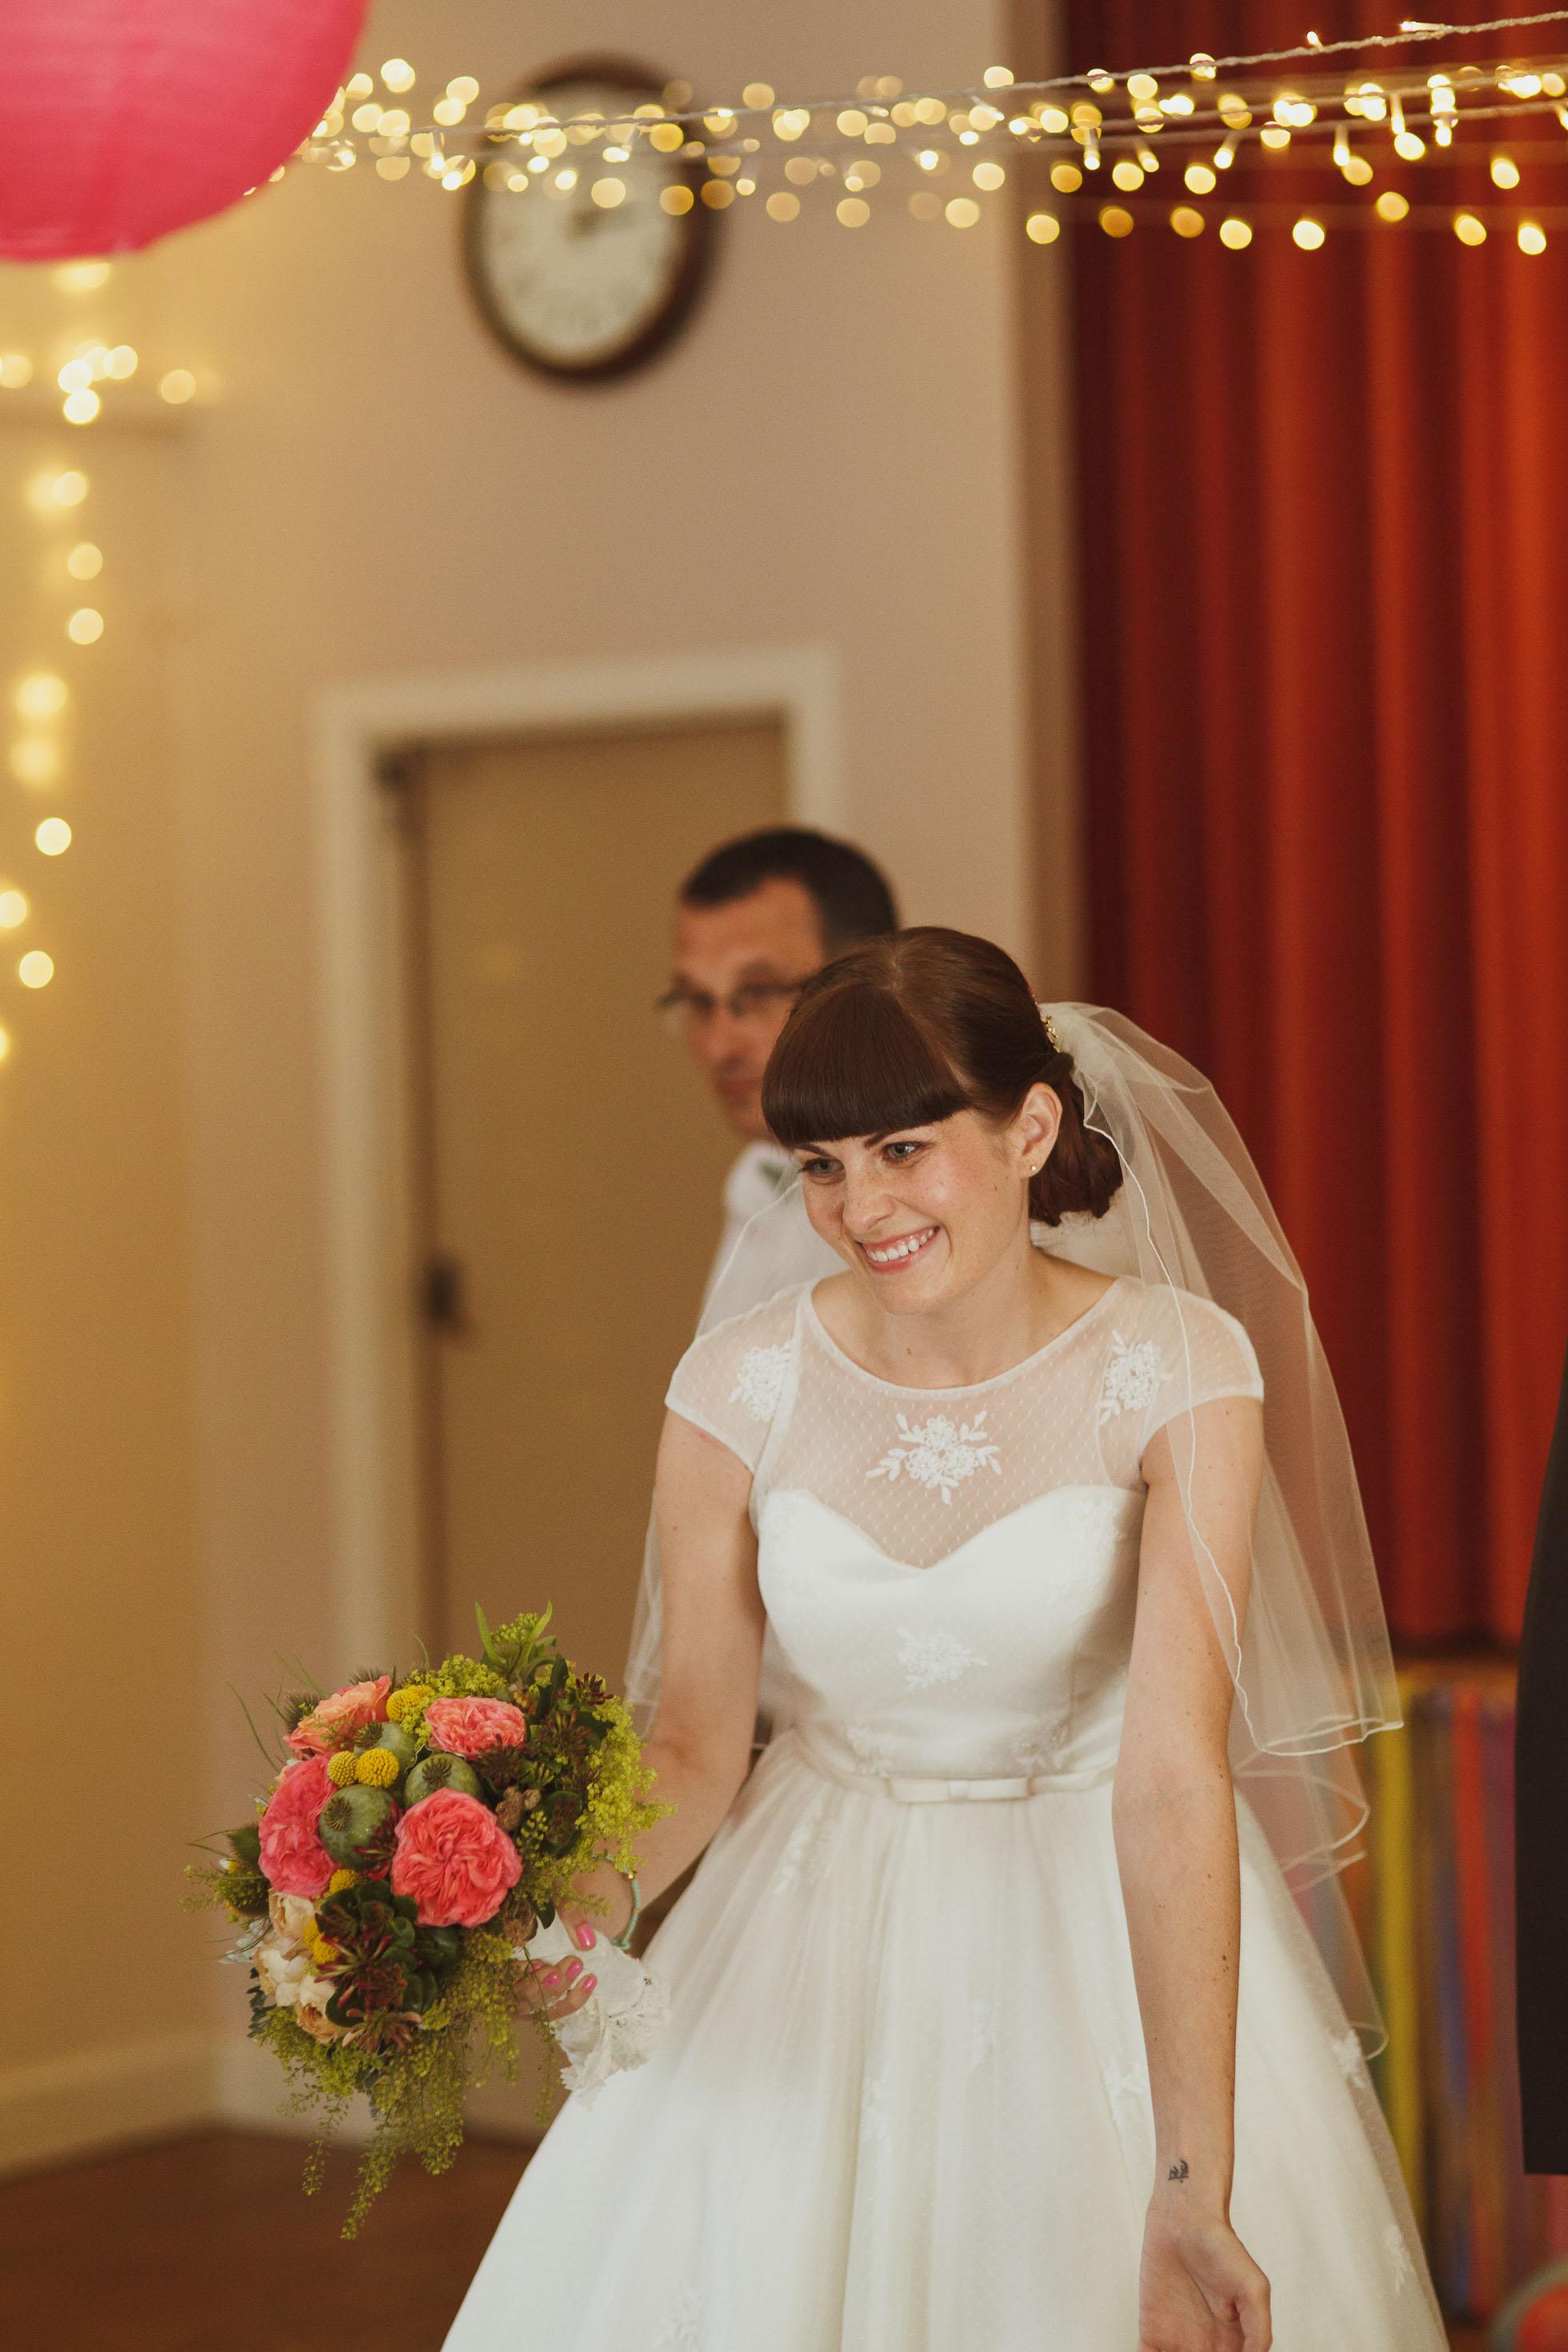 hackness wedding photographer-49.jpg